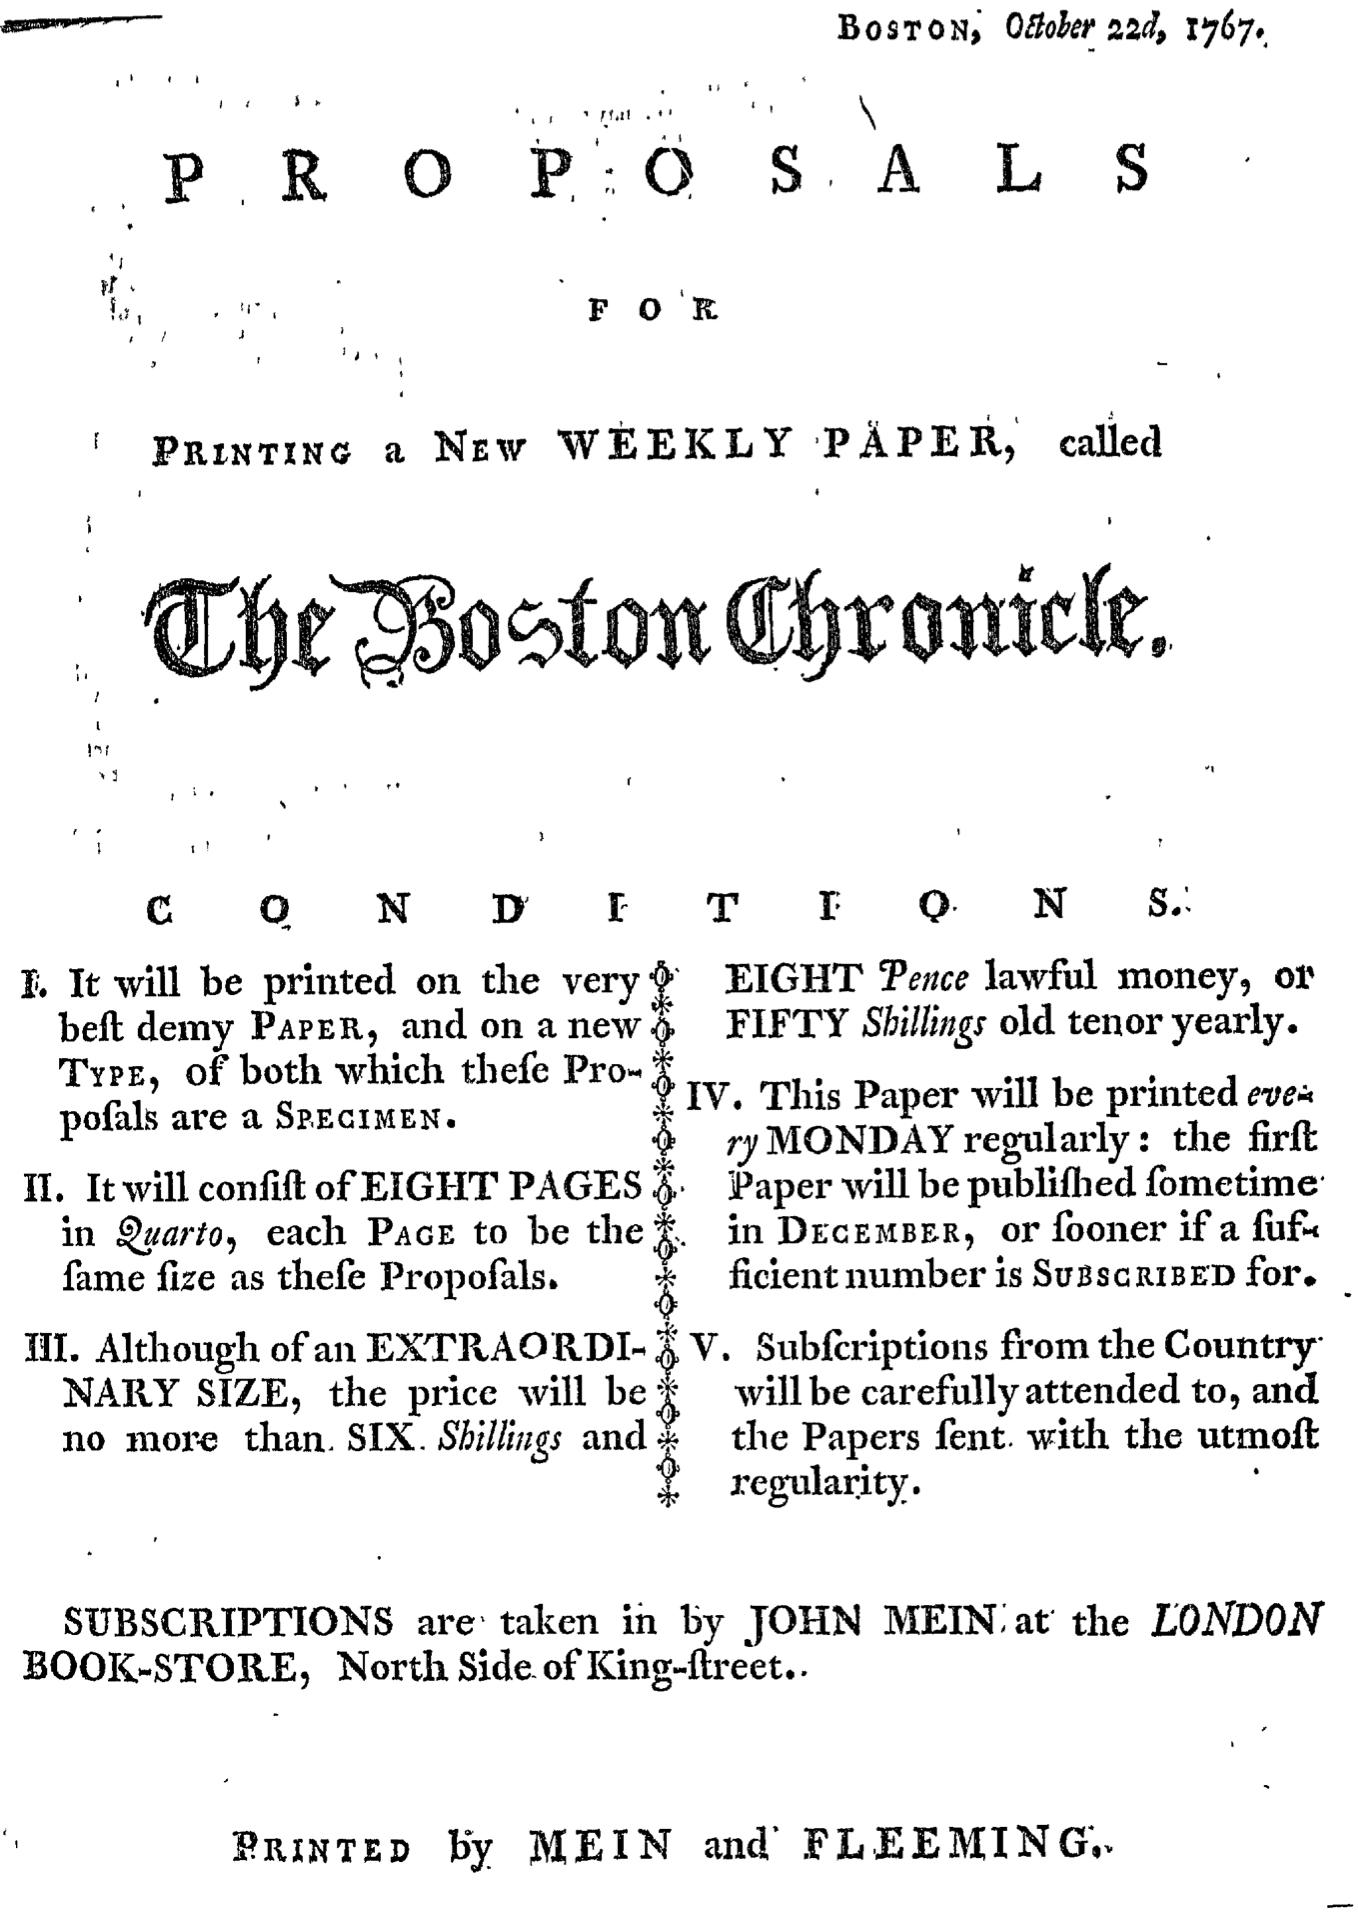 Oct 22 - 10:22:1767 Page 1 Boston Chronicle